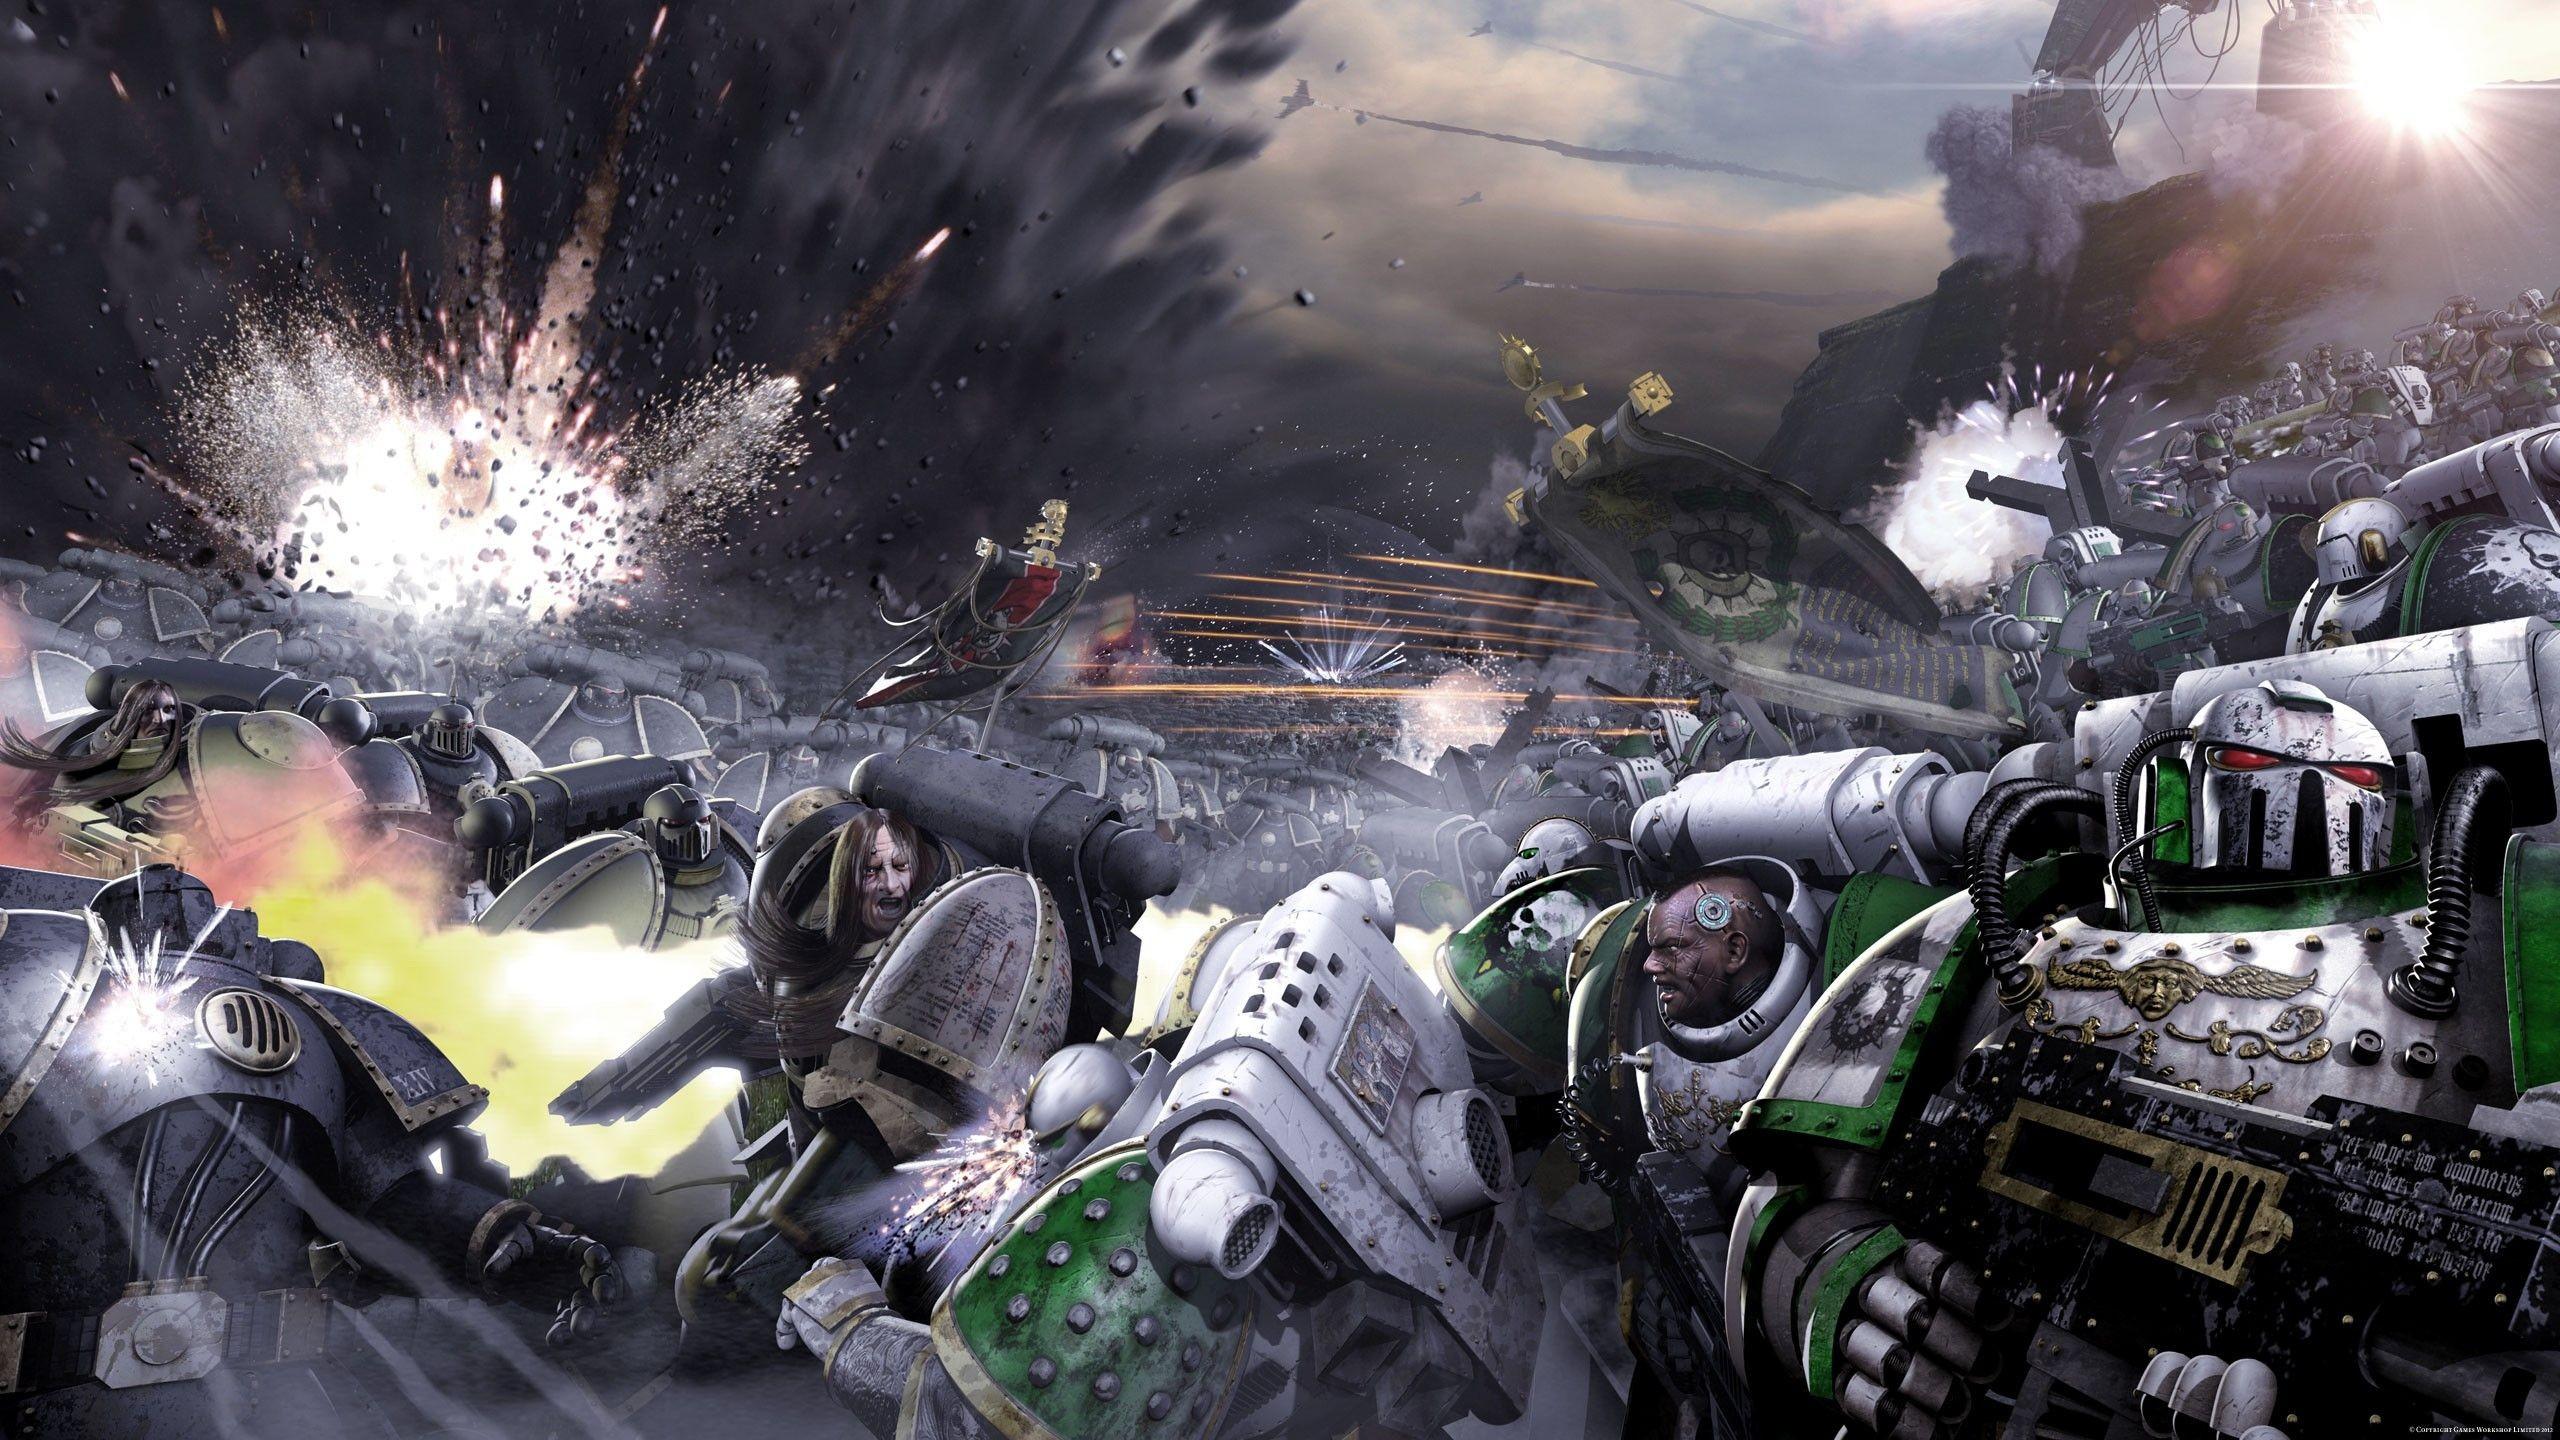 Warhammer 40k jpg 243831